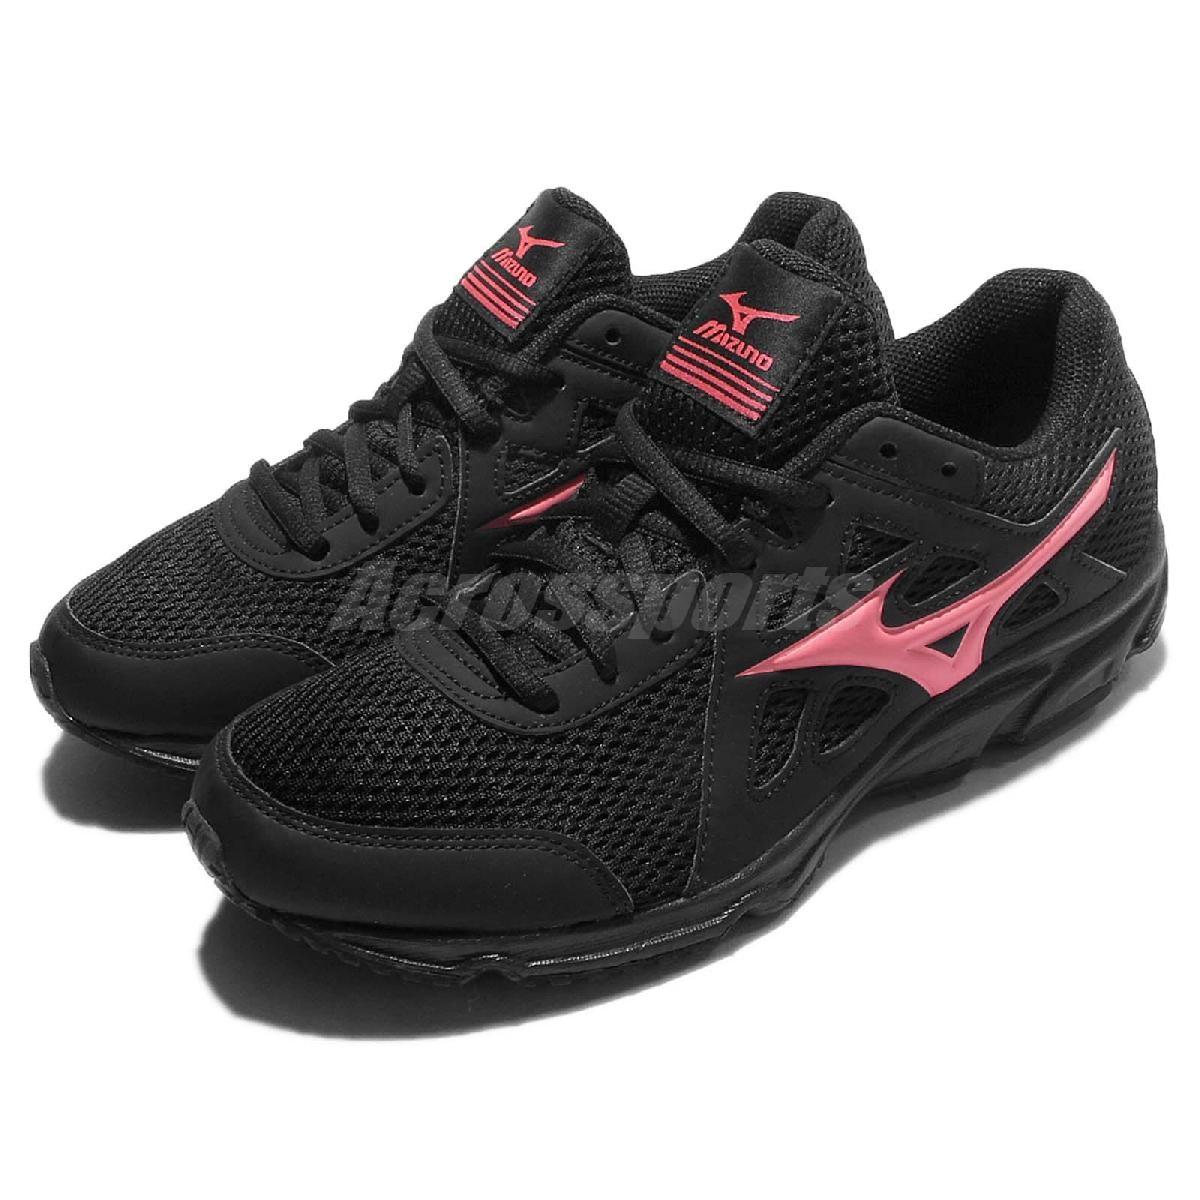 Mizuno 慢跑鞋 Maximizer 19 黑 粉紅 網布 透氣輕量 女鞋【PUMP306】 K1GA170155